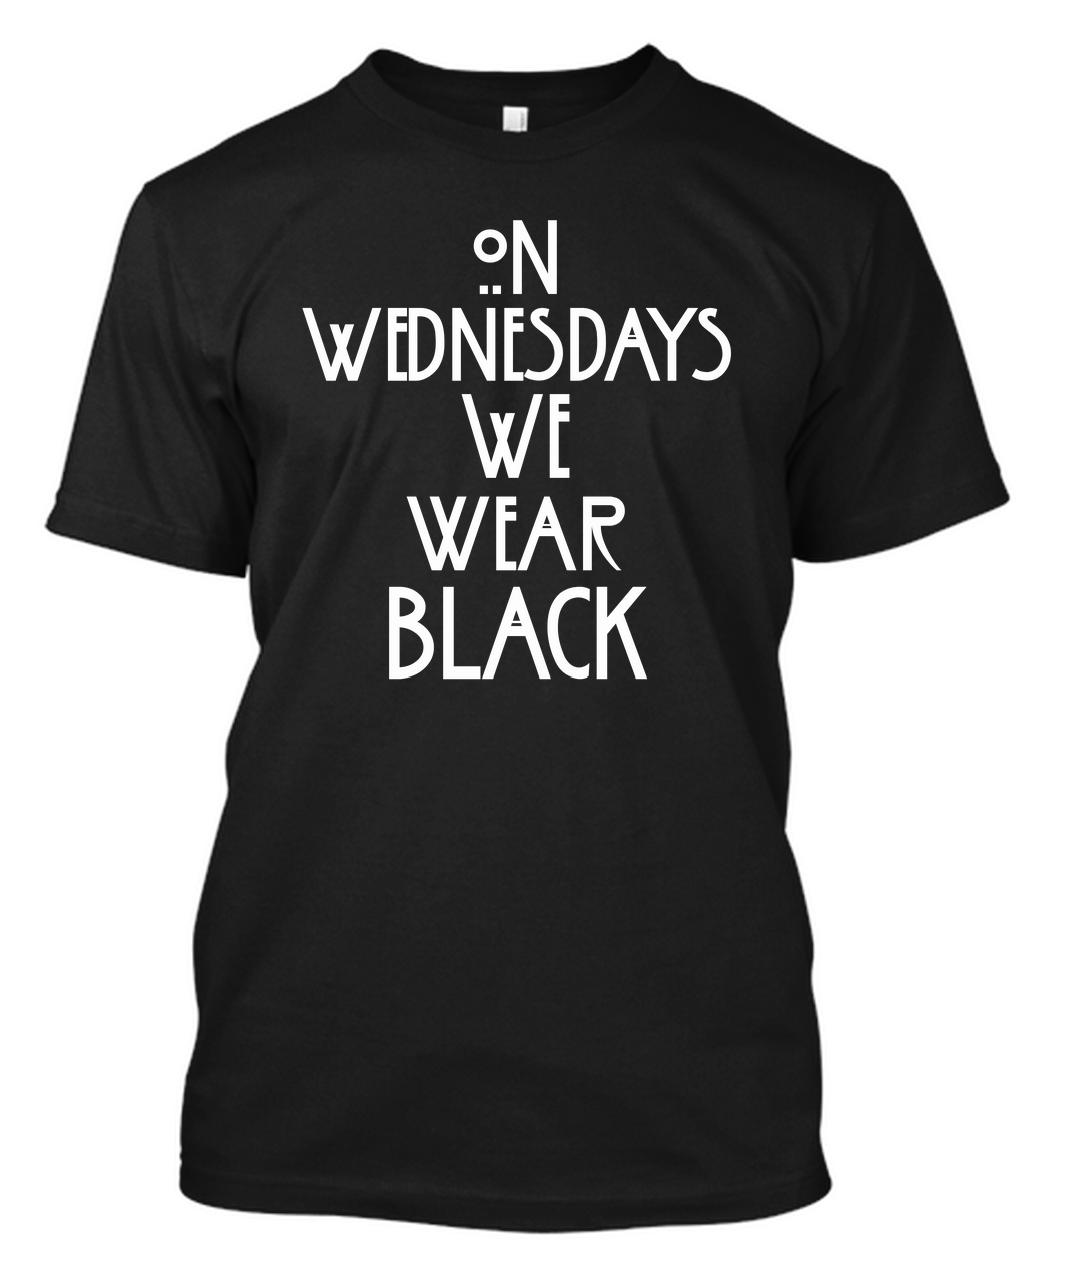 On wednesdays we wear black shirt